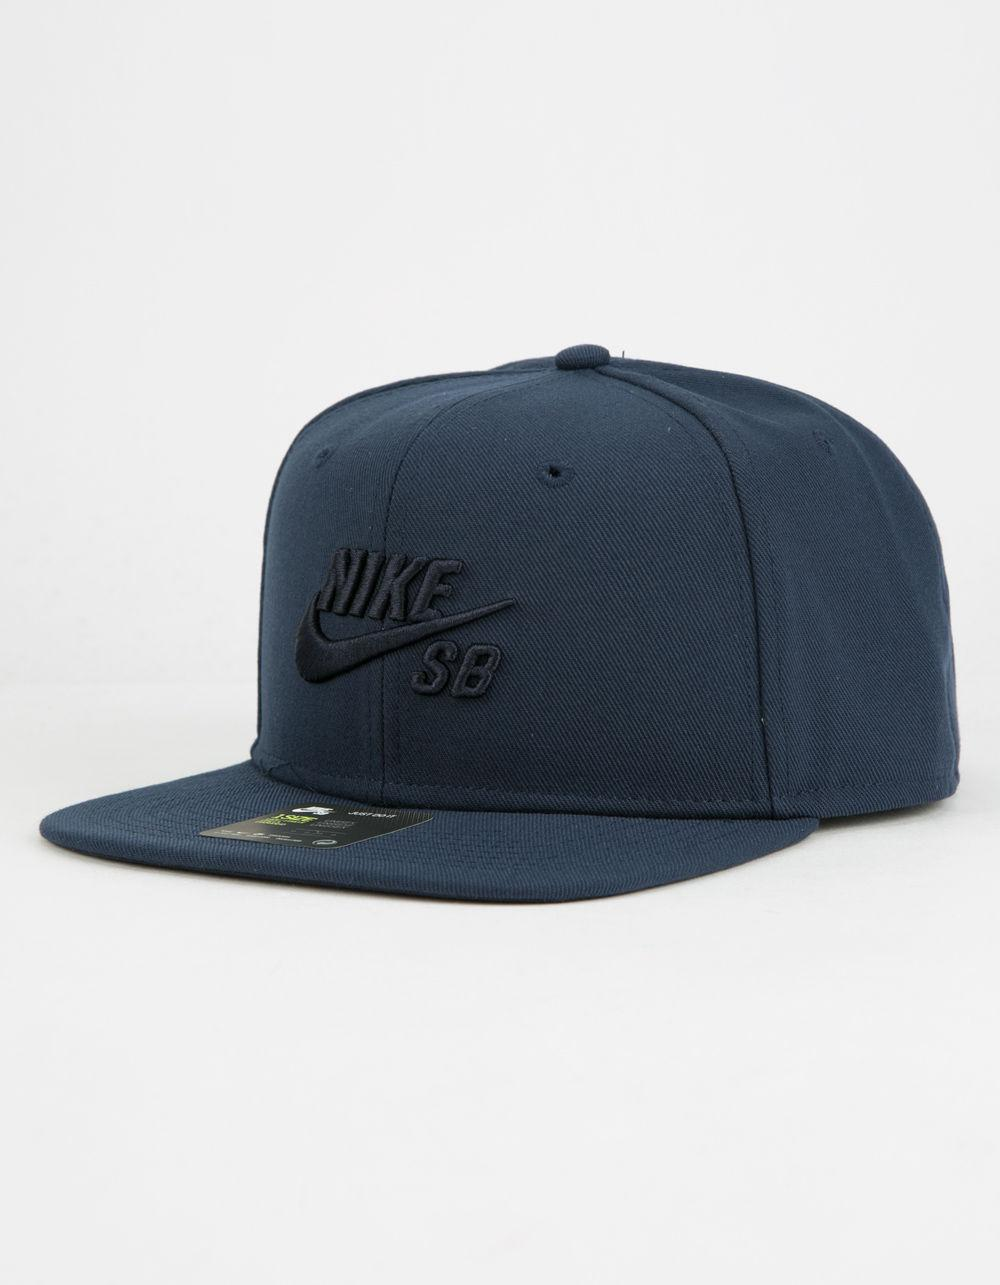 075633e2 Lyst - Nike Sb Icon Pro Mens Snapback Hat in Blue for Men